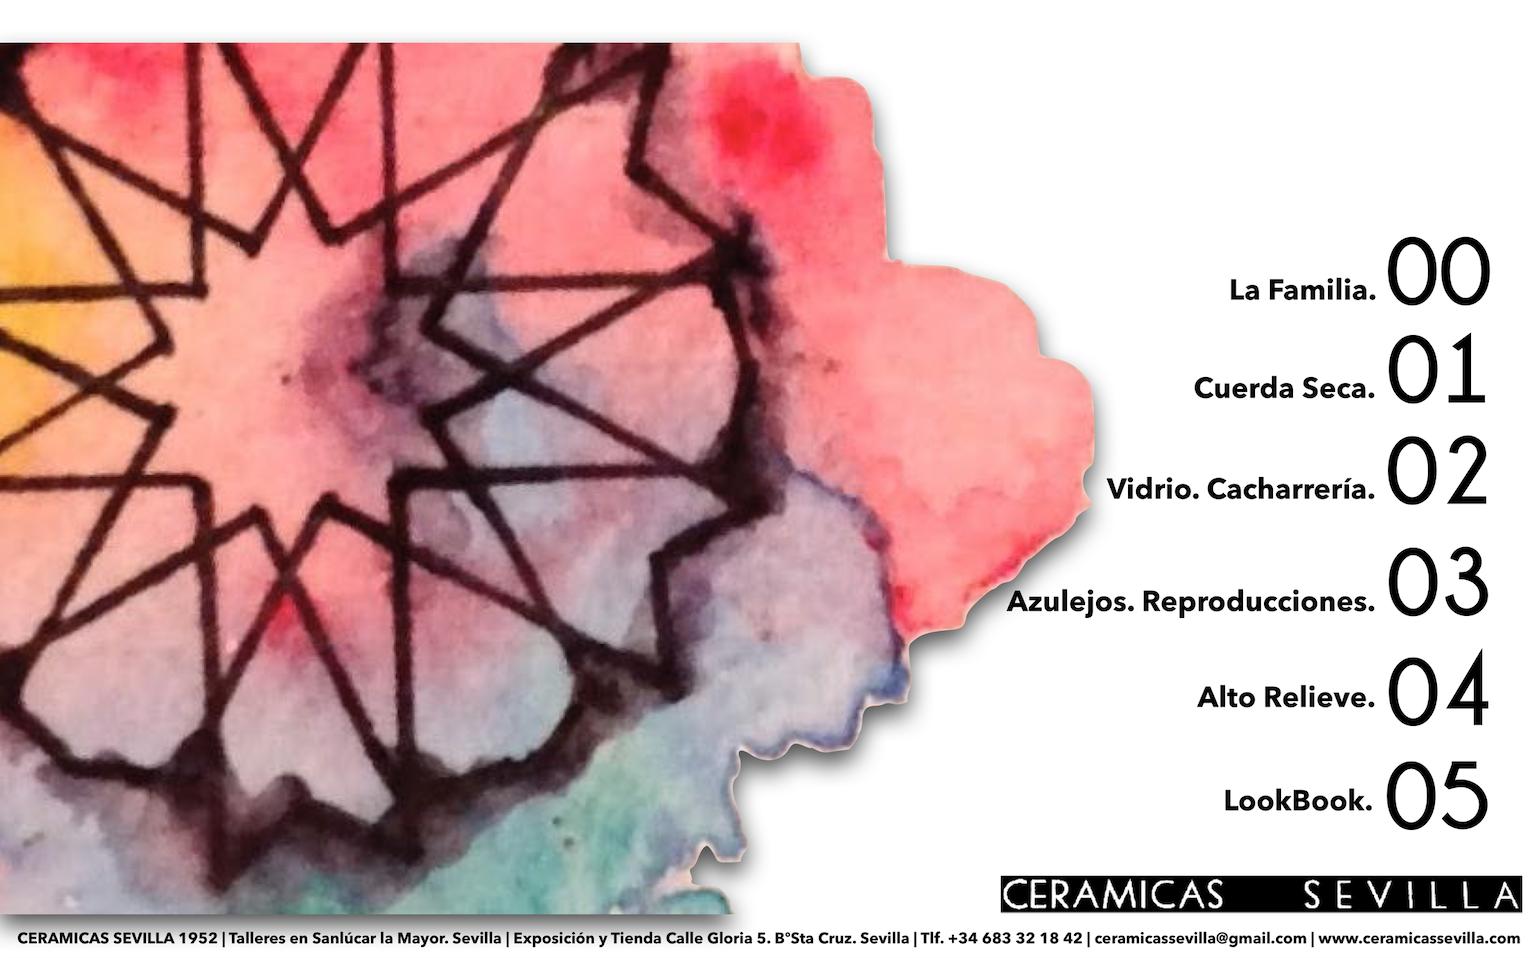 Portfolio Ceramicas Sevilla Pagina 2.png